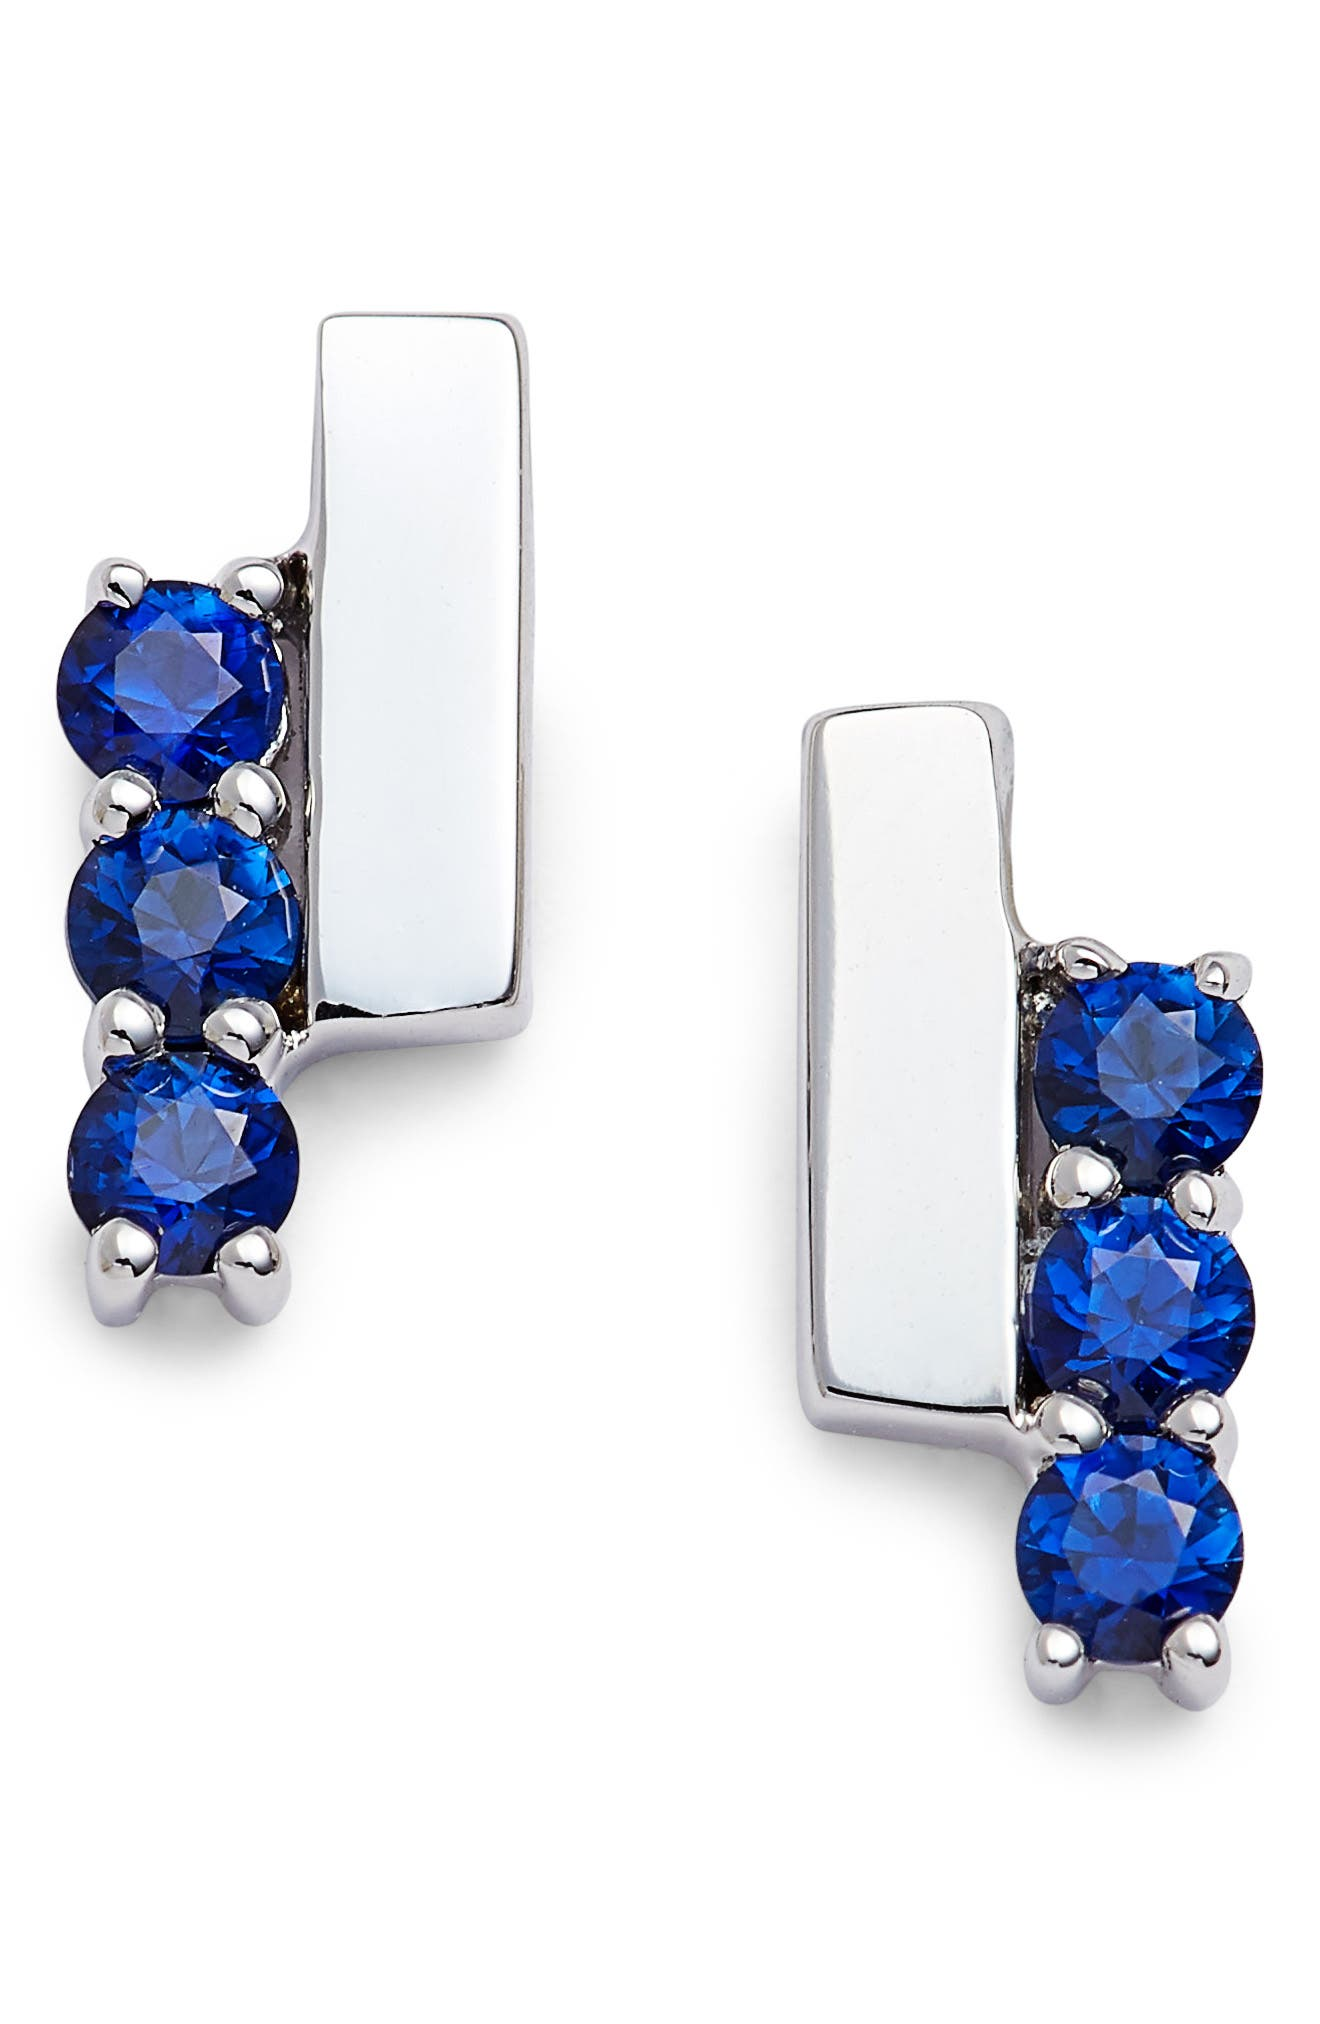 Sylvie Rose Sapphire Bar Stud Earrings,                         Main,                         color, White Gold/ Blue Sapphire